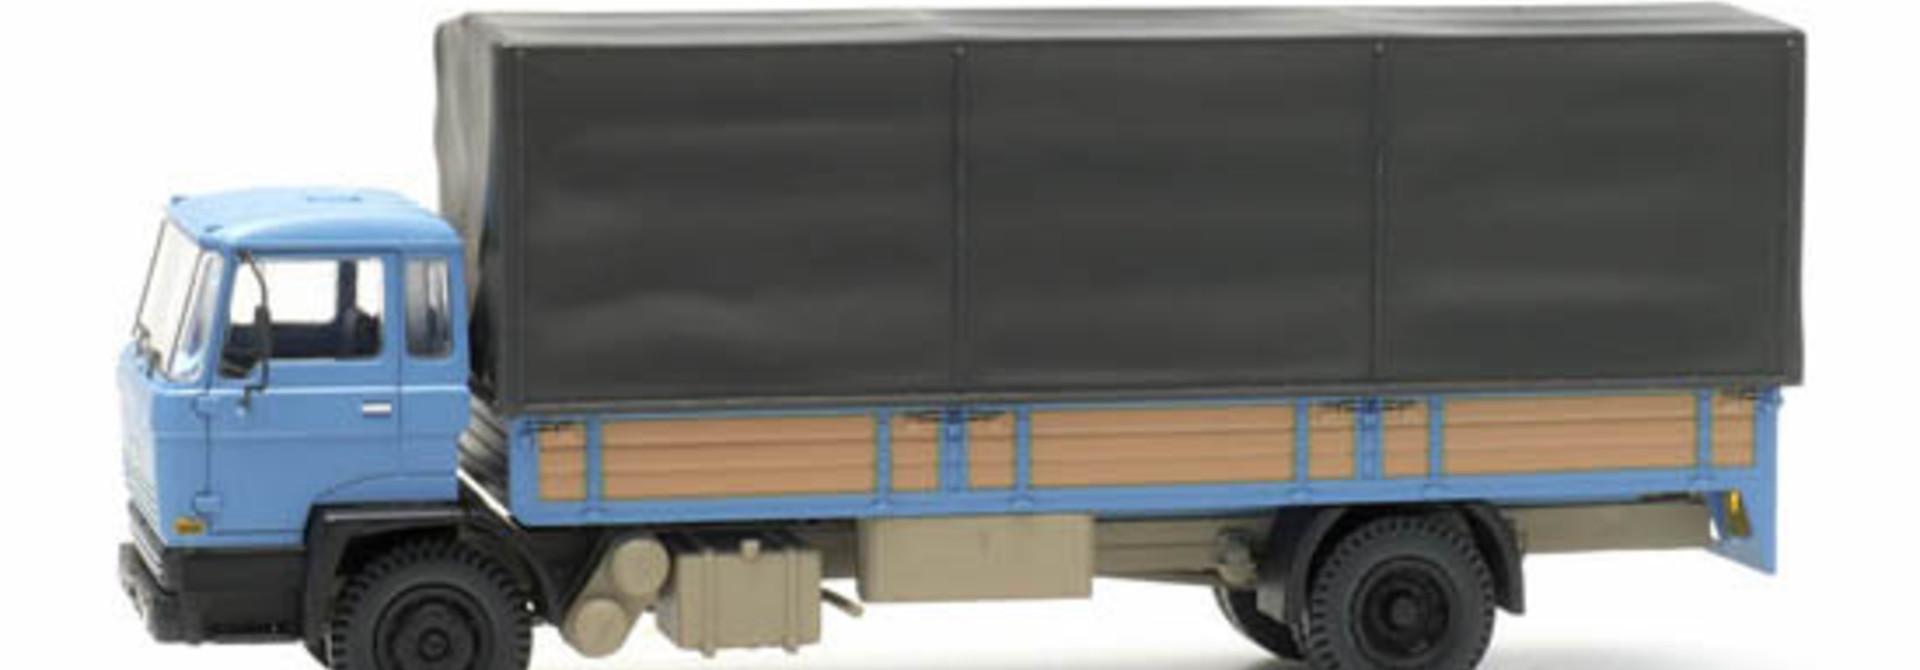 487.051.01 - DAF Kantelcabine, cabine 1970, blauw